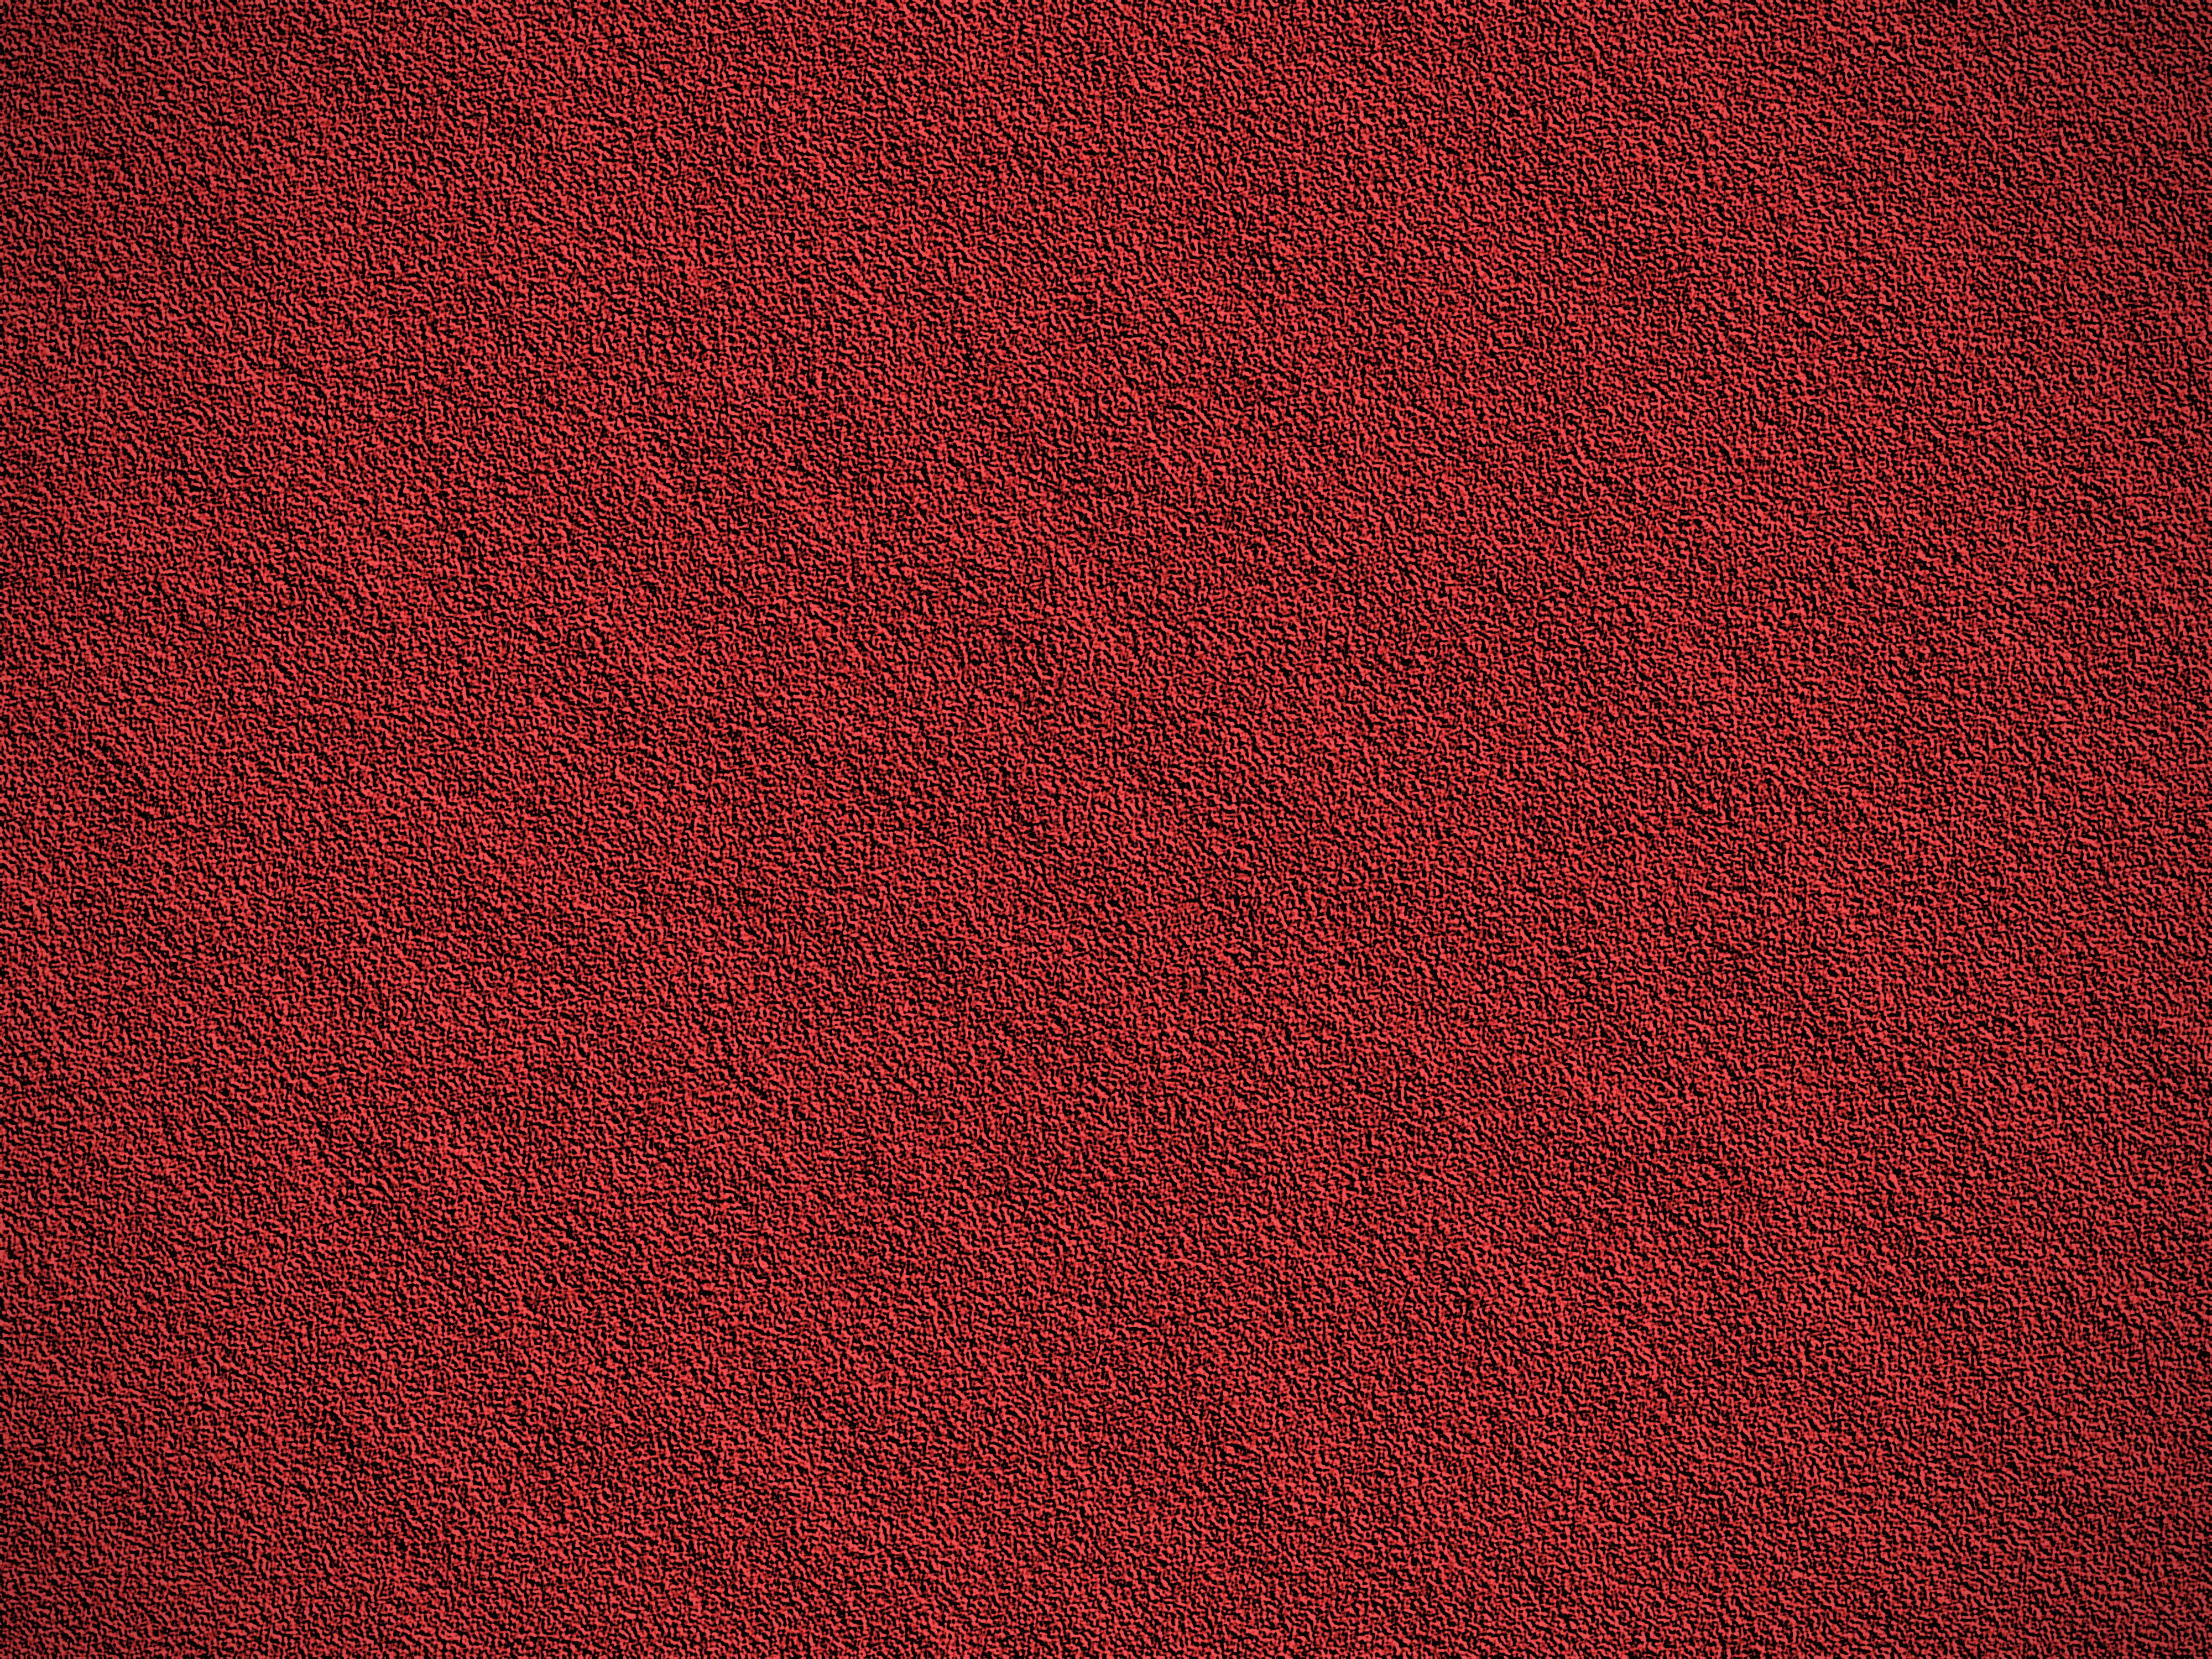 Rough Texture Background: Seamless Textures